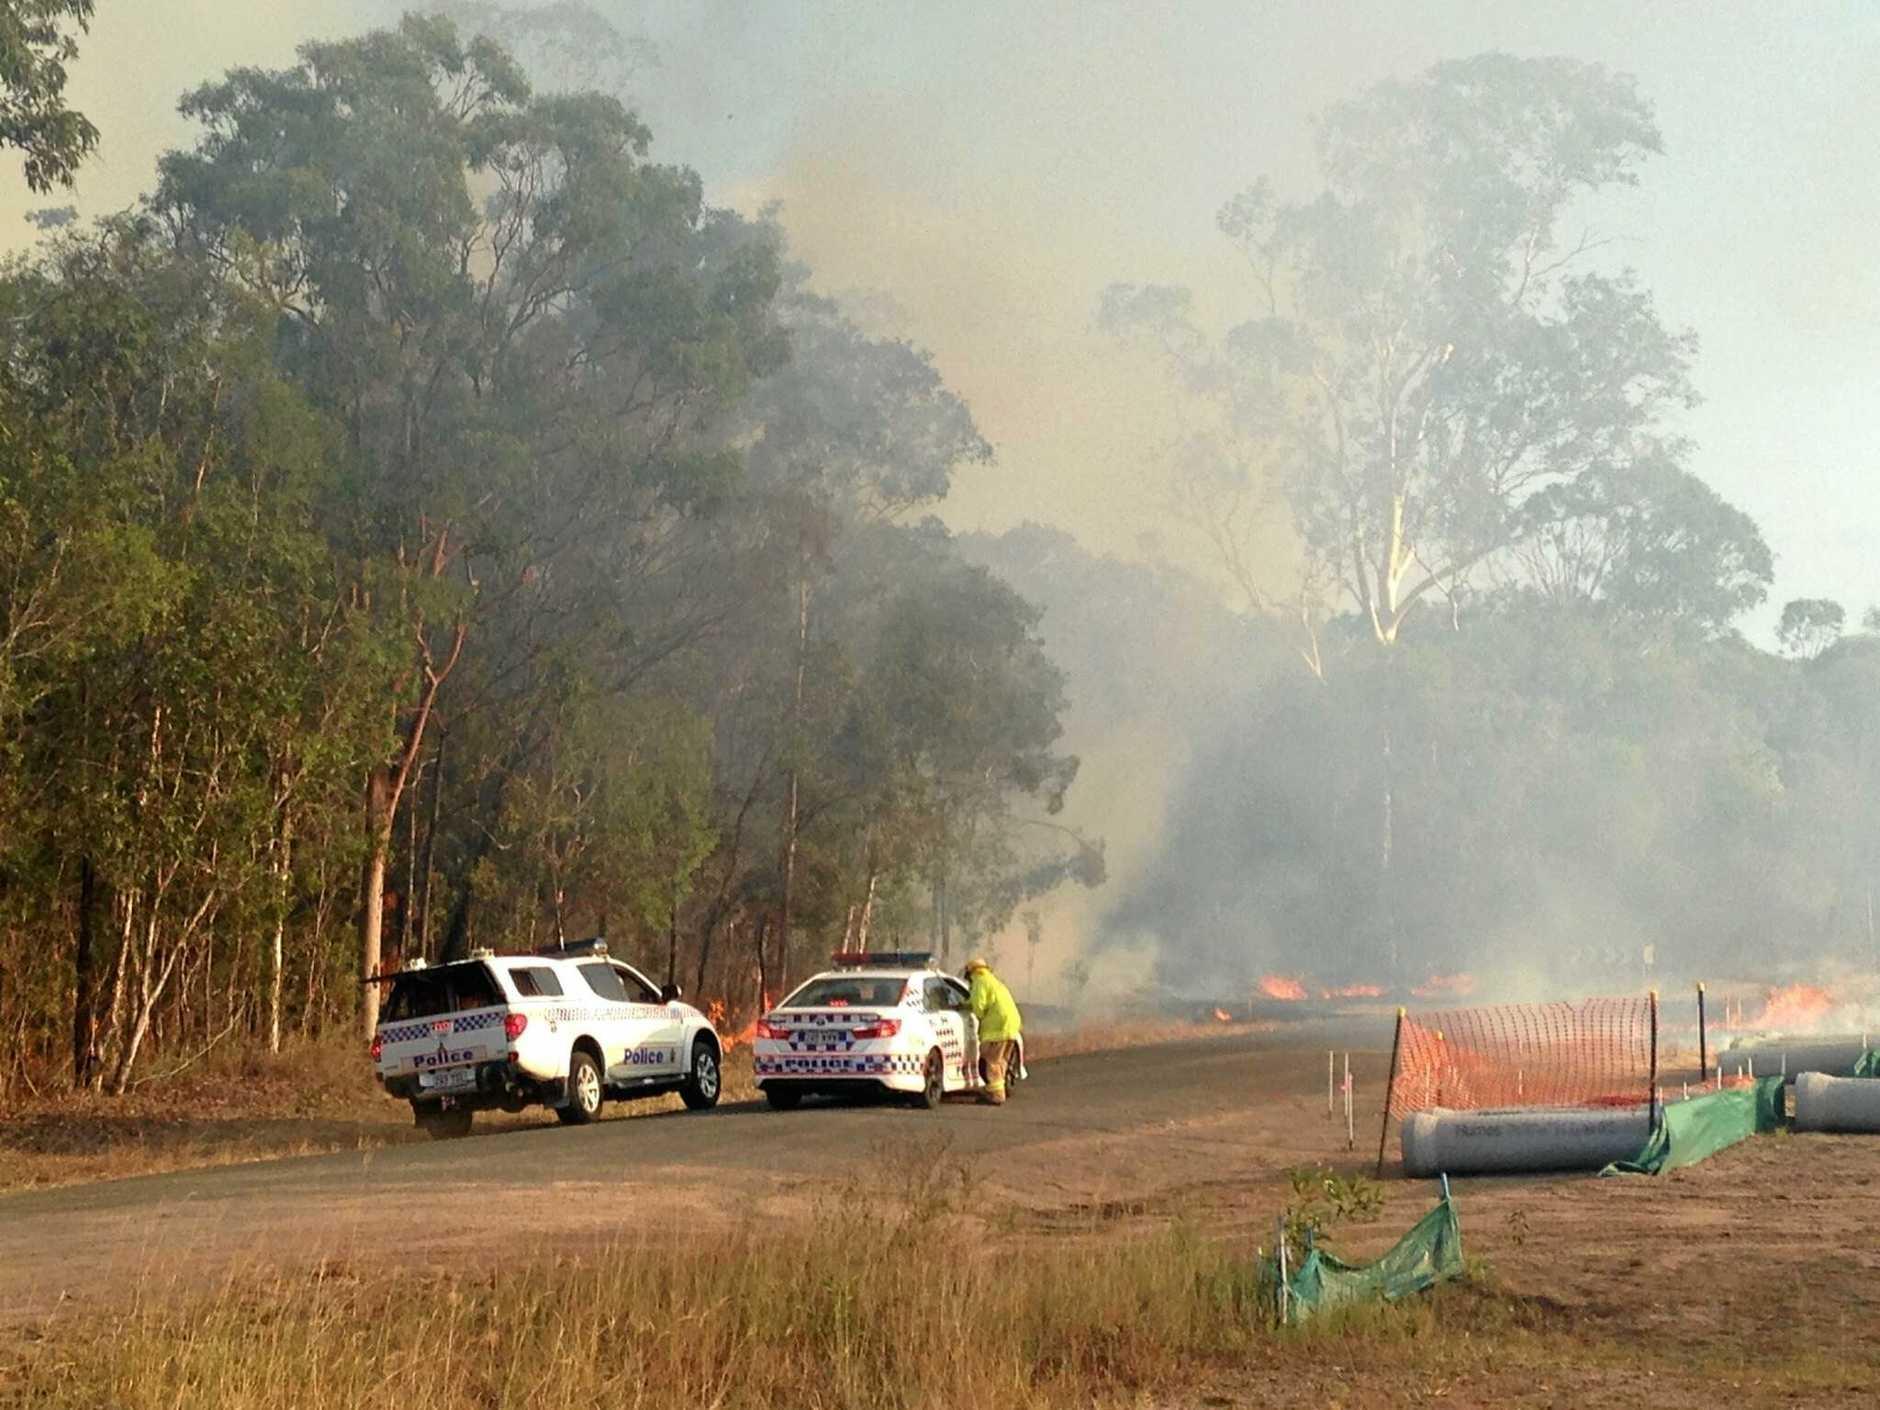 BREAKING: Crews battle fire in Urangan.